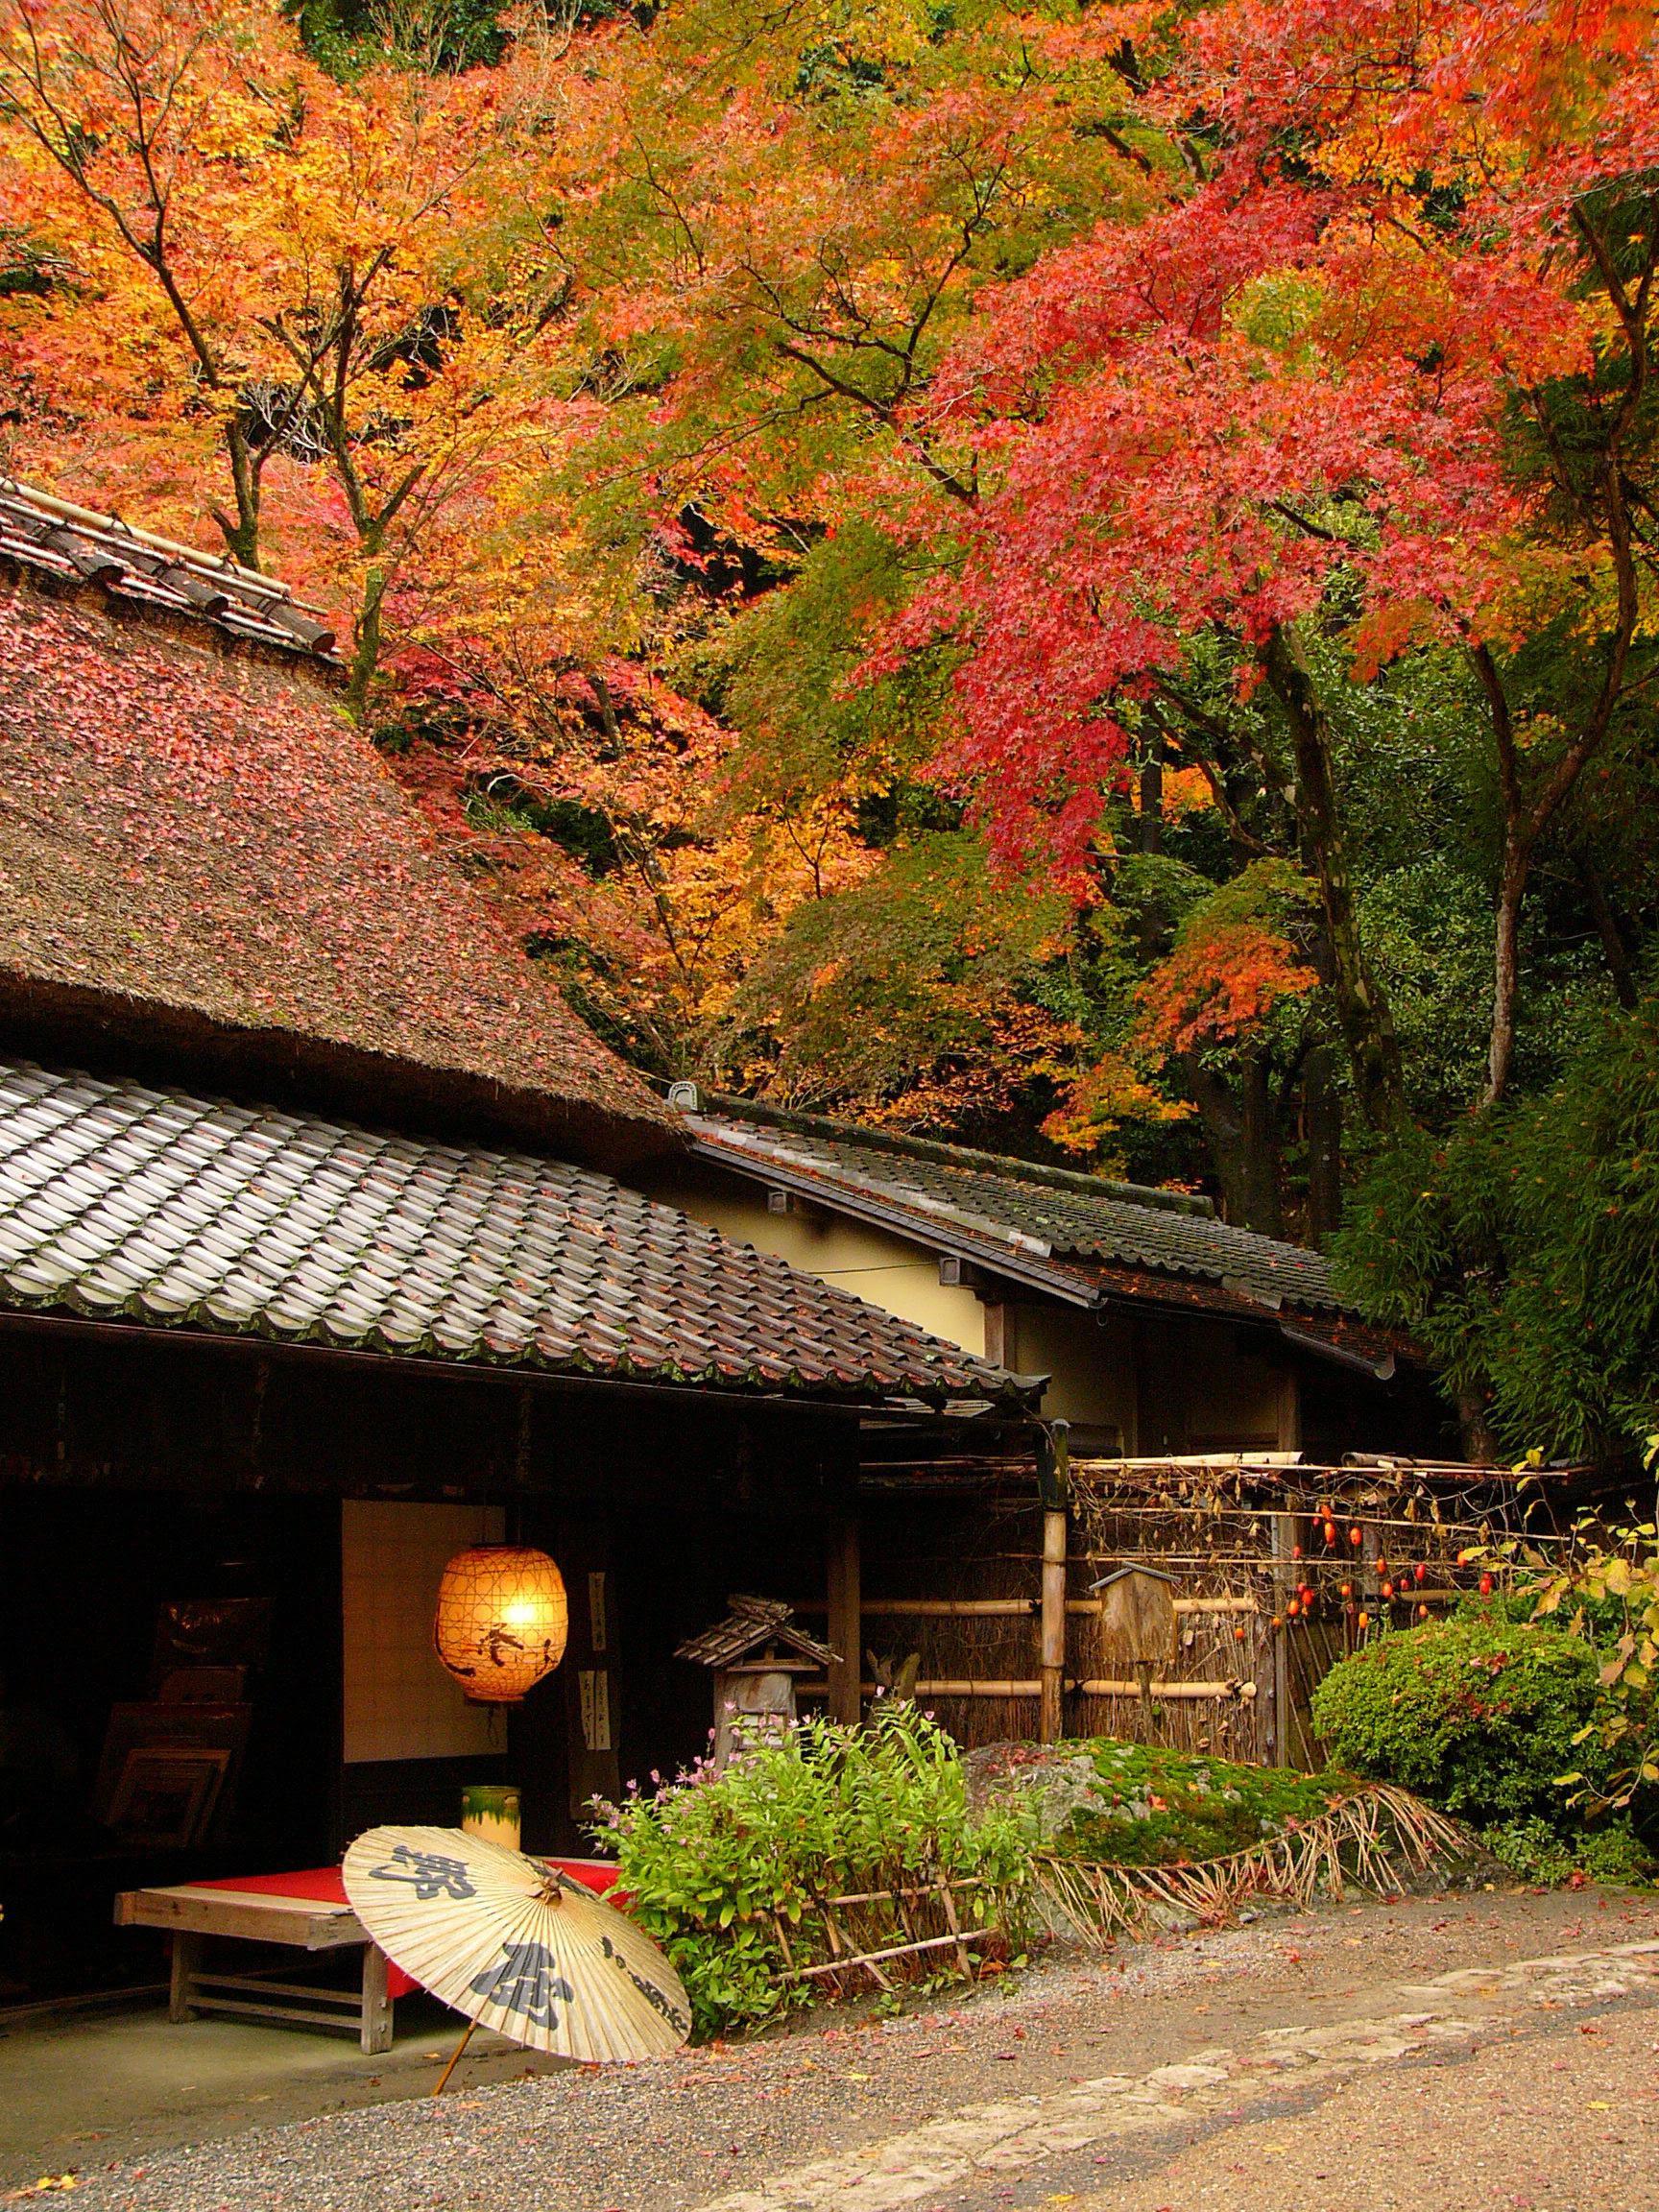 Travel Review: Unique Japan Cultural Experience, Tokyo ...